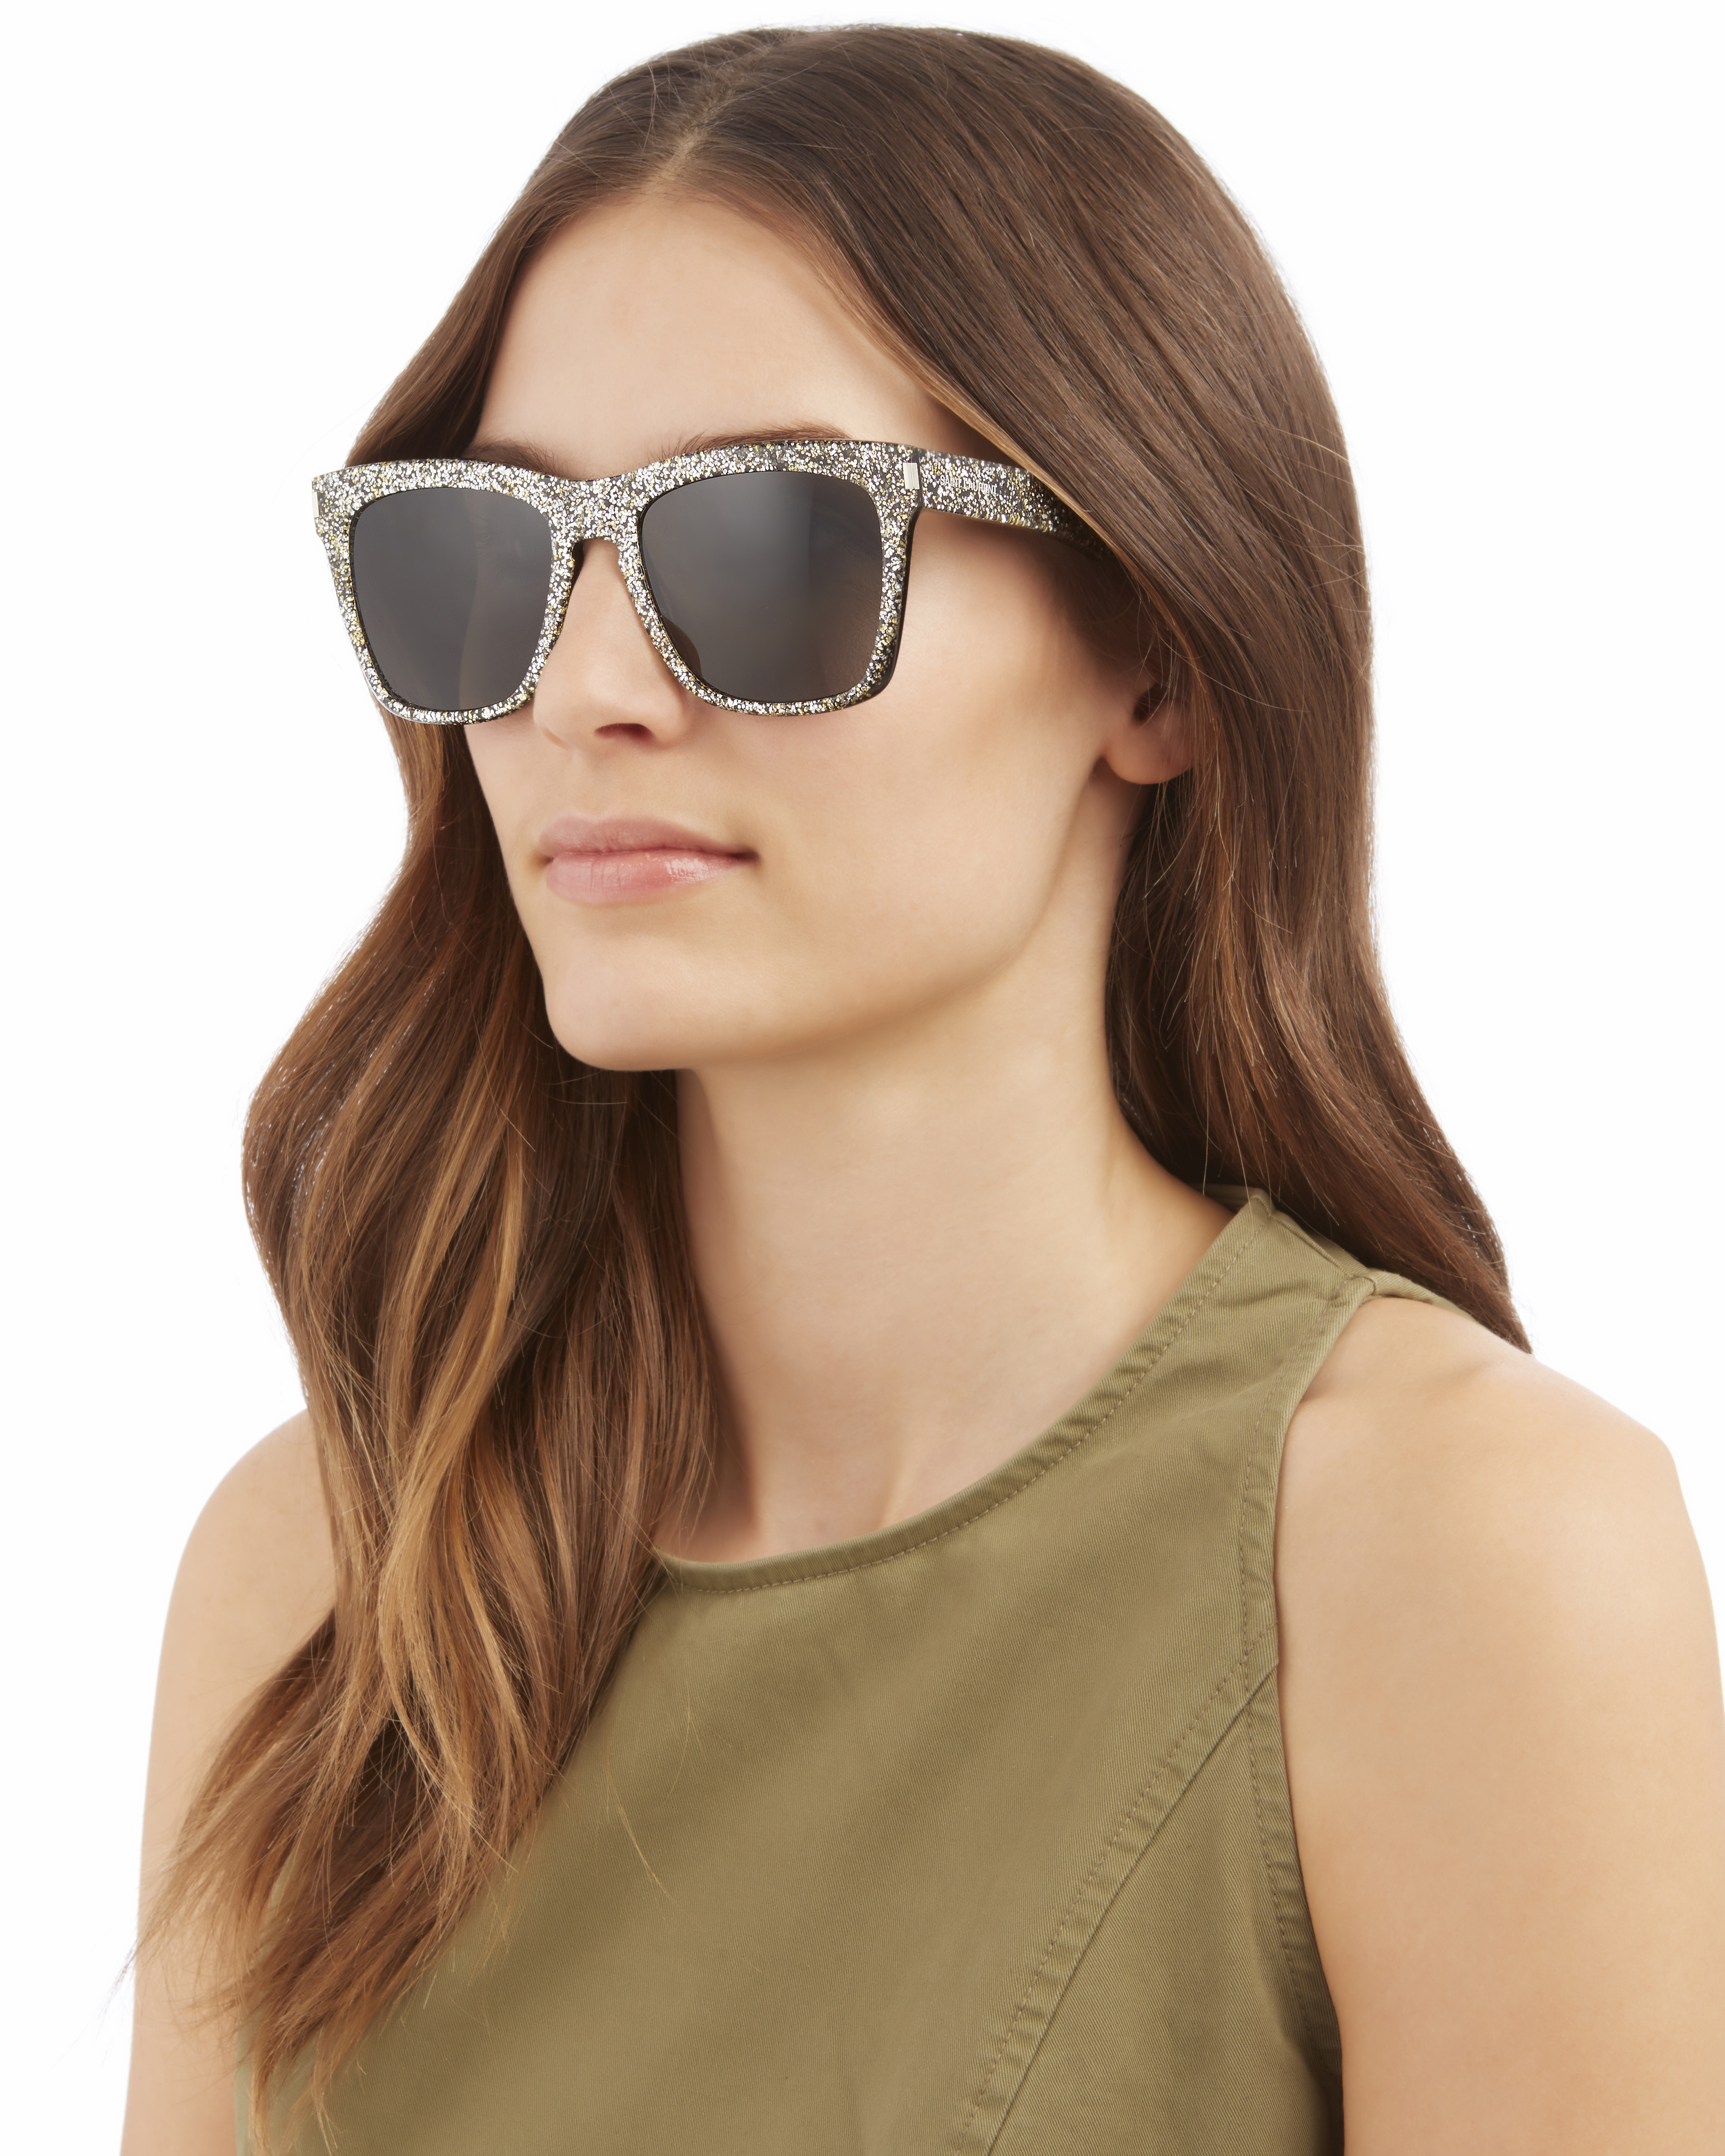 a9d5c2f334 Saint Laurent Devon Glitter Sunglasses